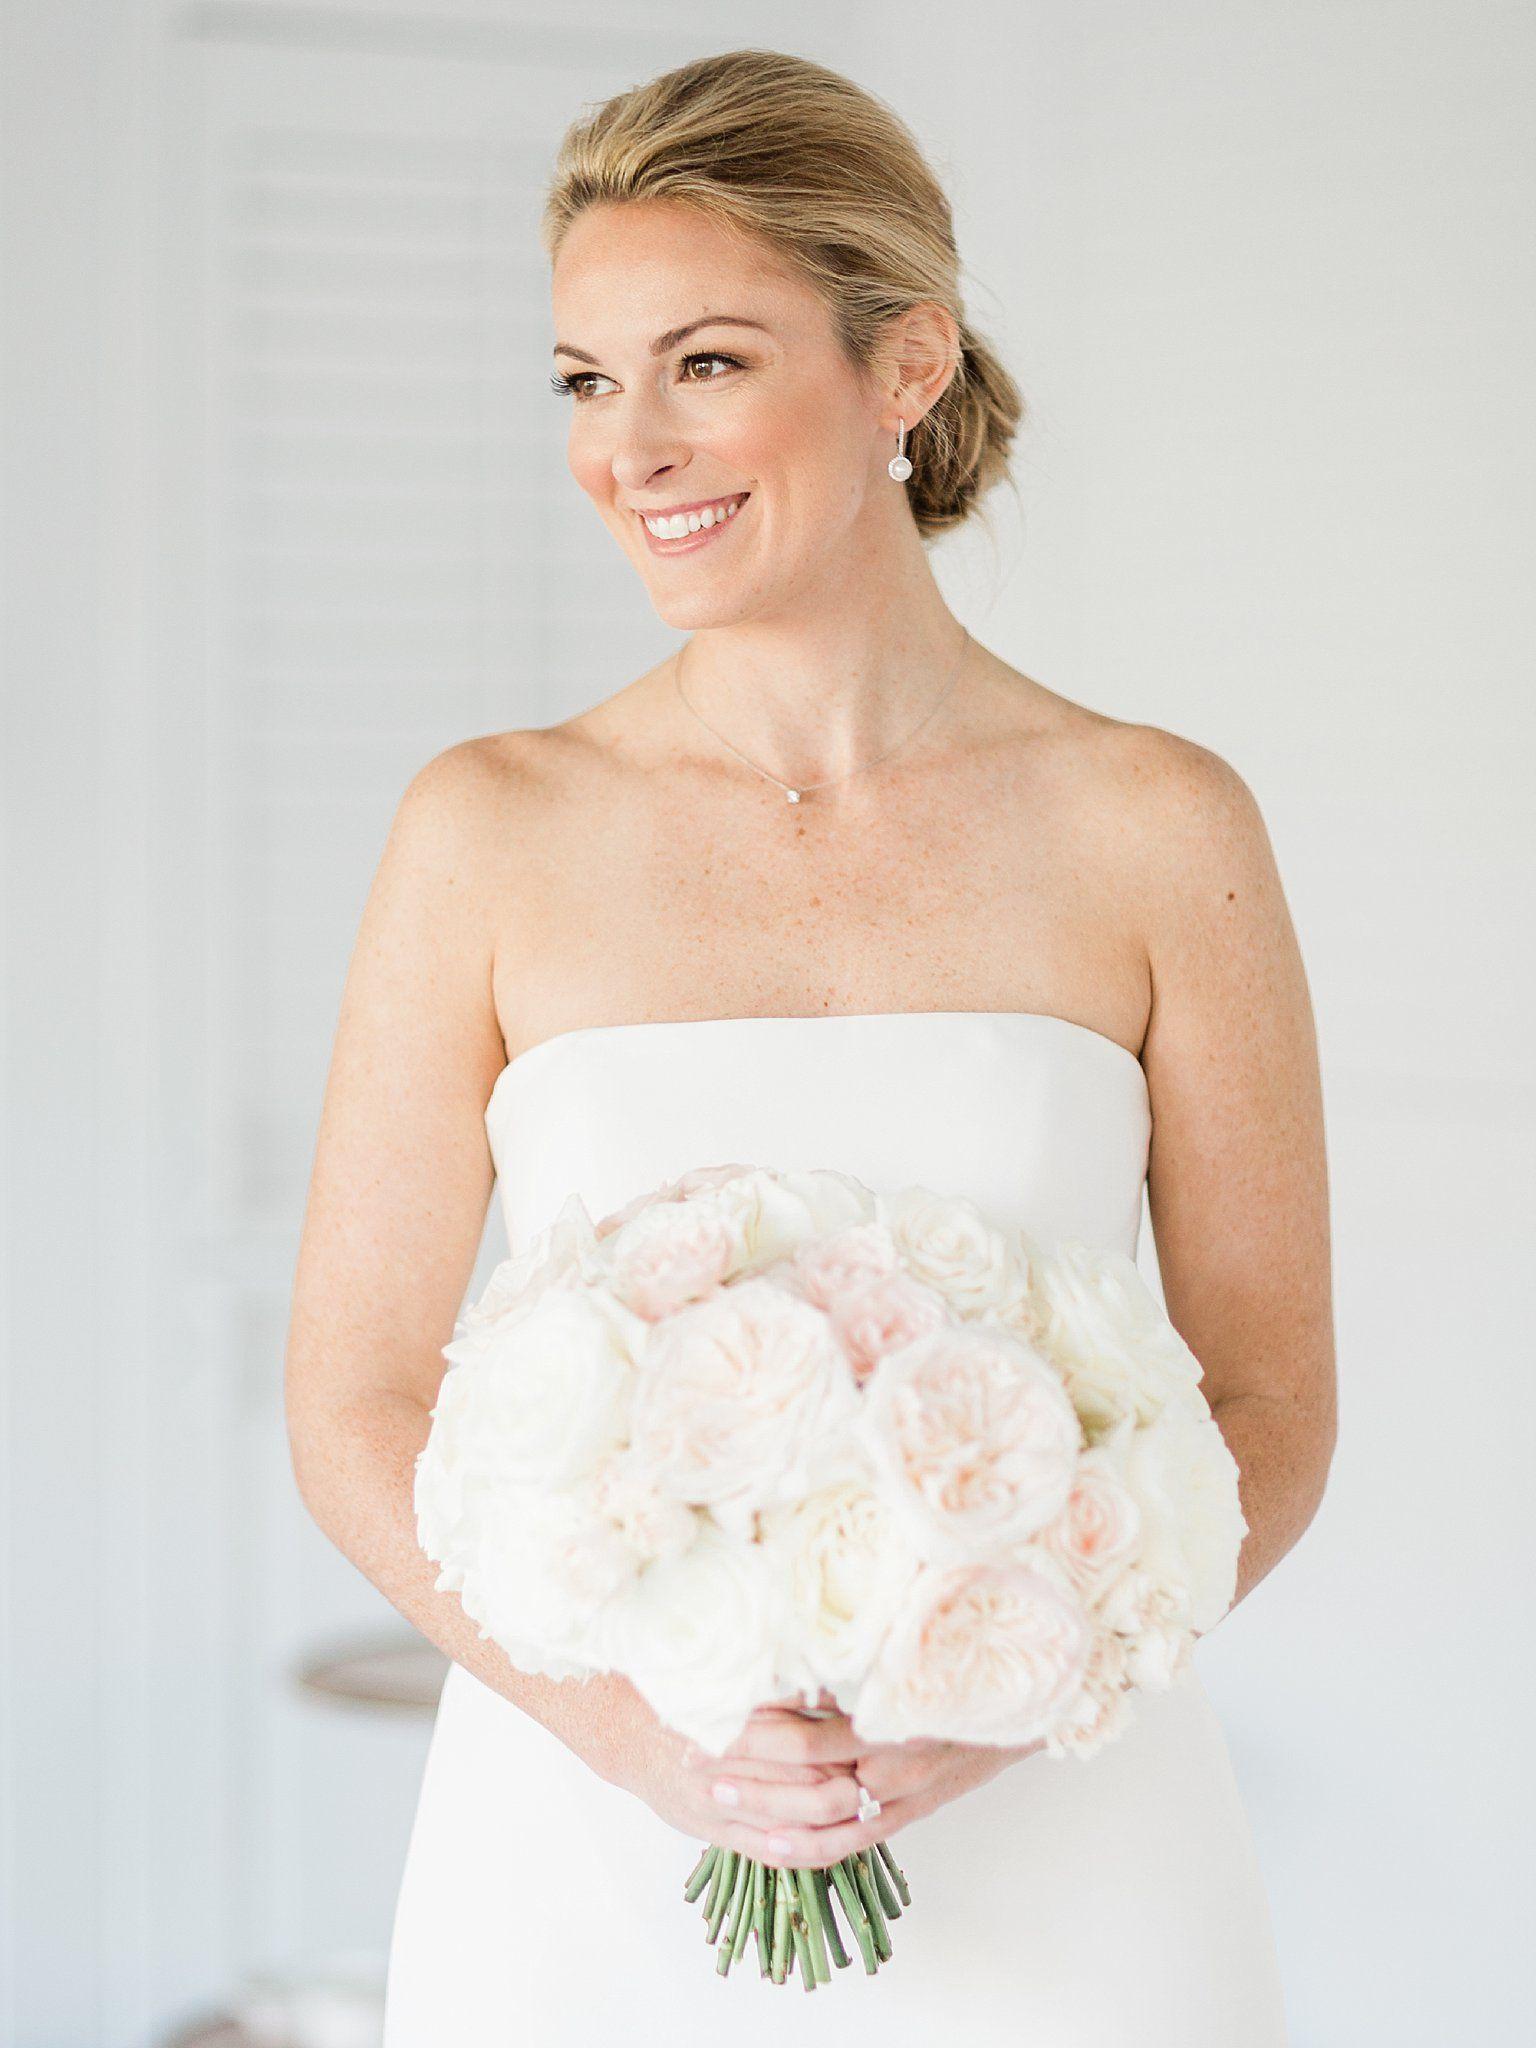 elegant bridal portrait with blush garden rose bouquet. hair